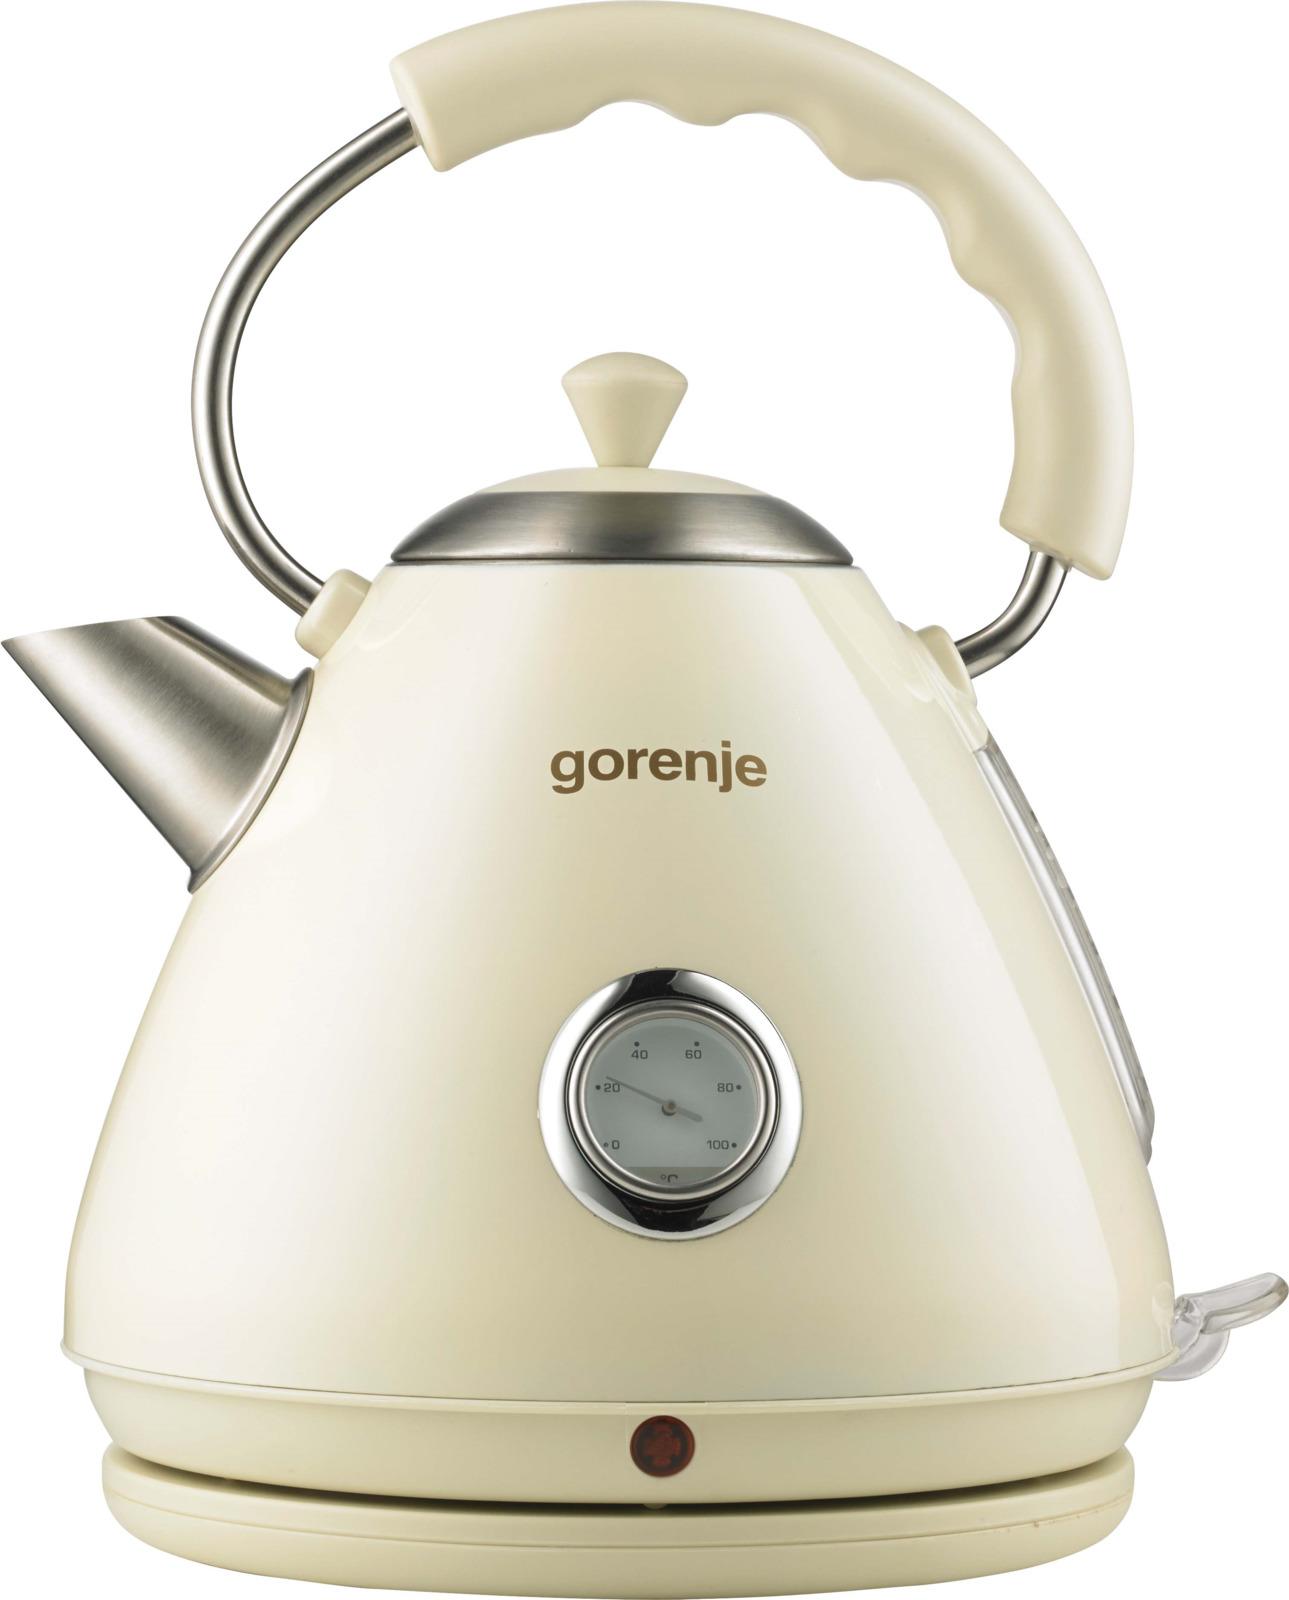 Электрический чайник Gorenje K17CLI, 577531, бежевый, 1,7 л